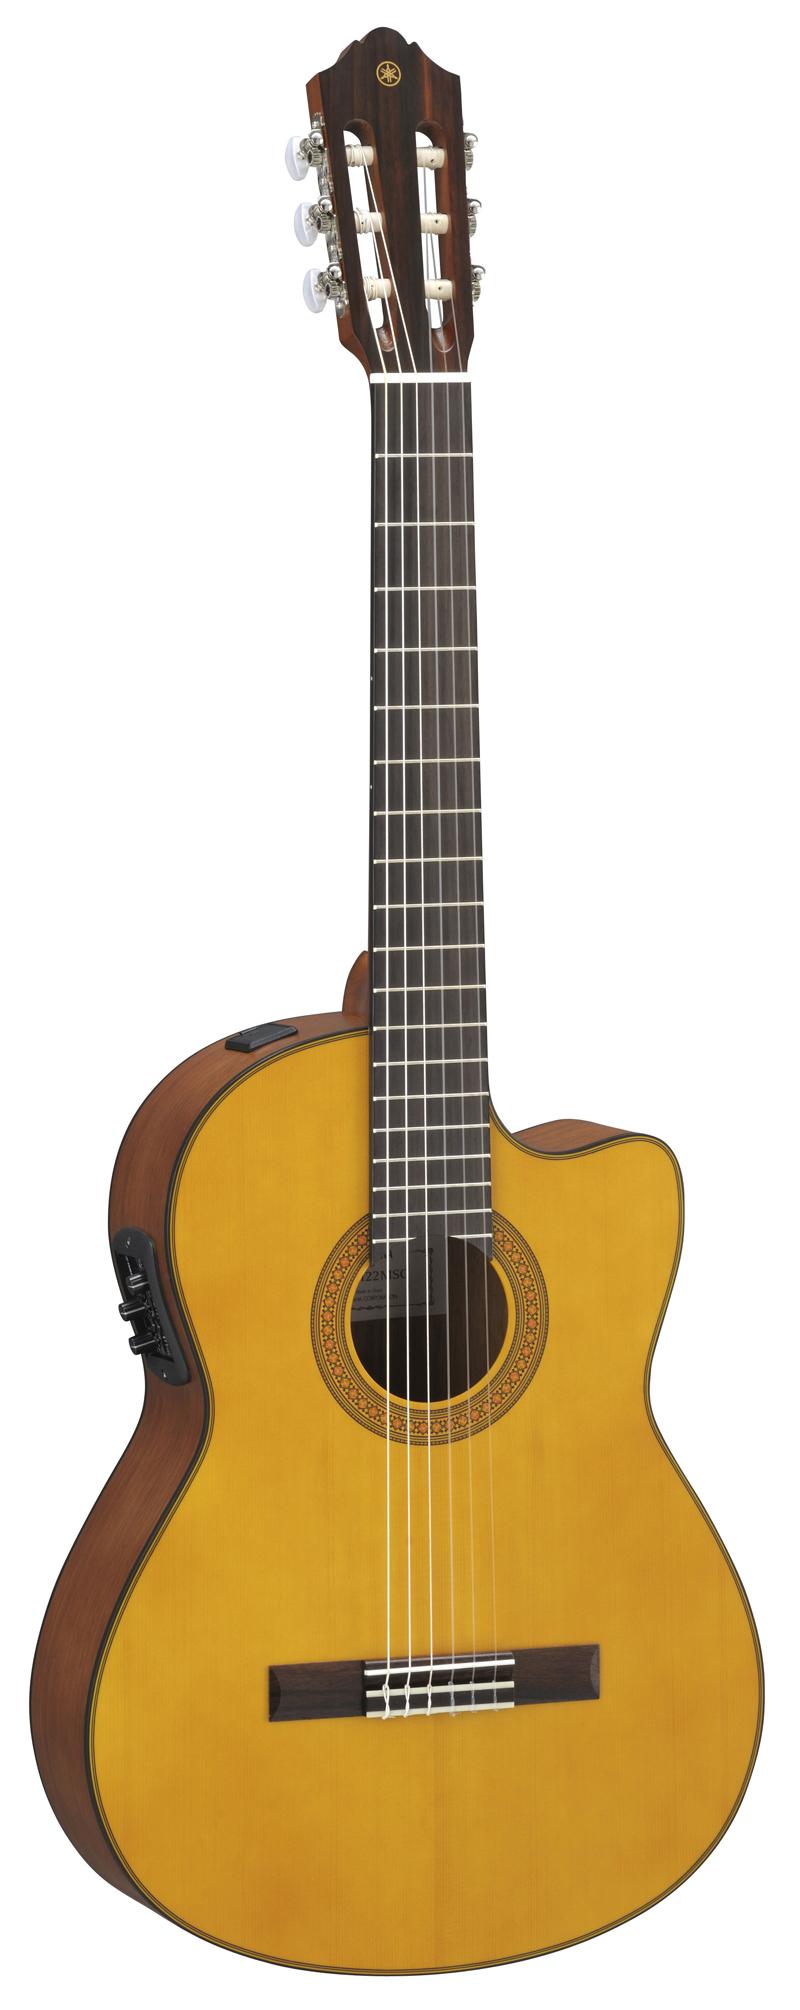 yamaha cgx122 msc elektro akustik gitarre 4 4 natur. Black Bedroom Furniture Sets. Home Design Ideas